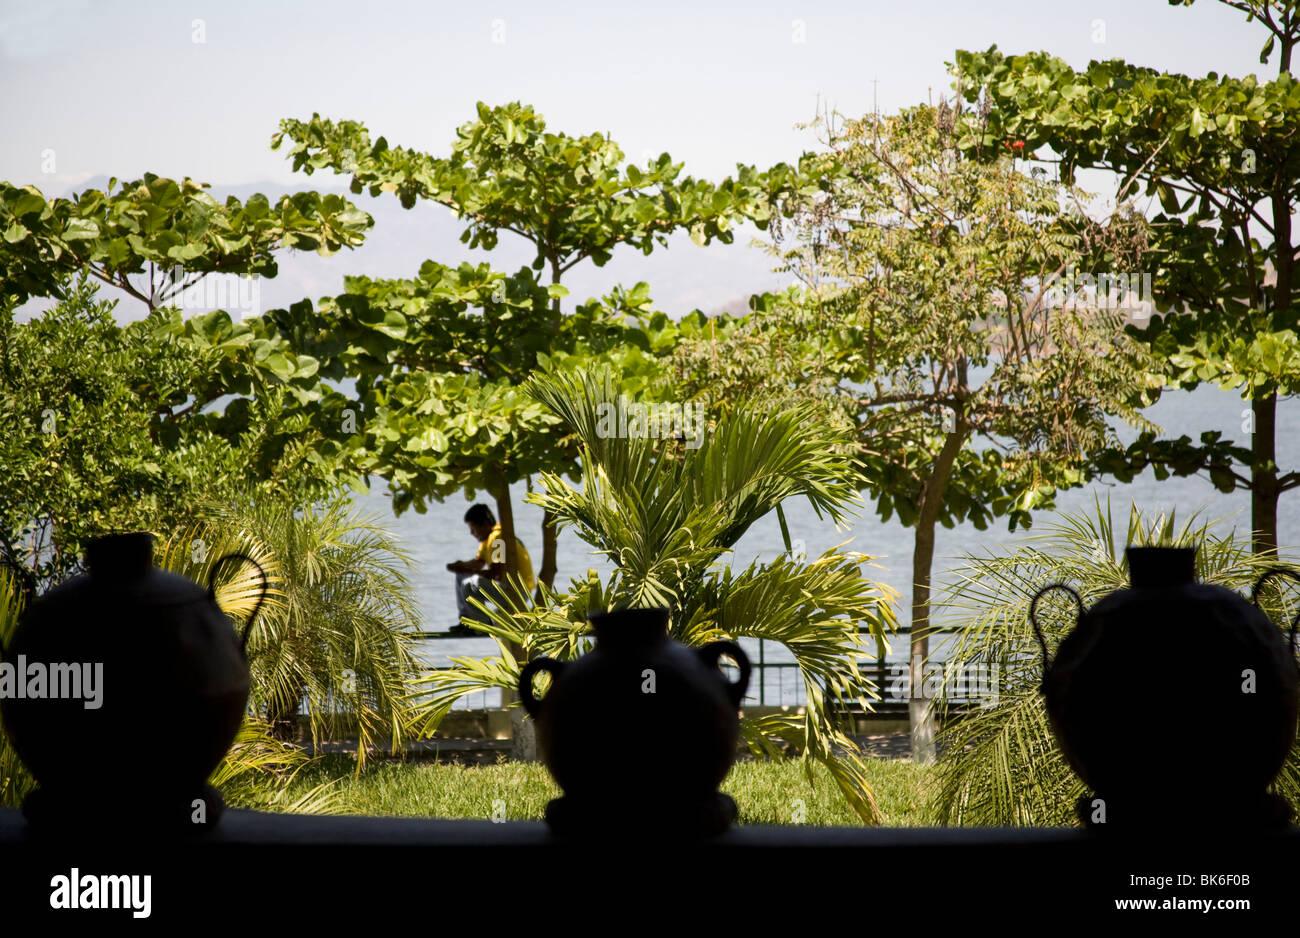 Silhouette of pots Centro Turistico Puerto San Juan Lake Suchitlan Suchitoto El Salvador - Stock Image